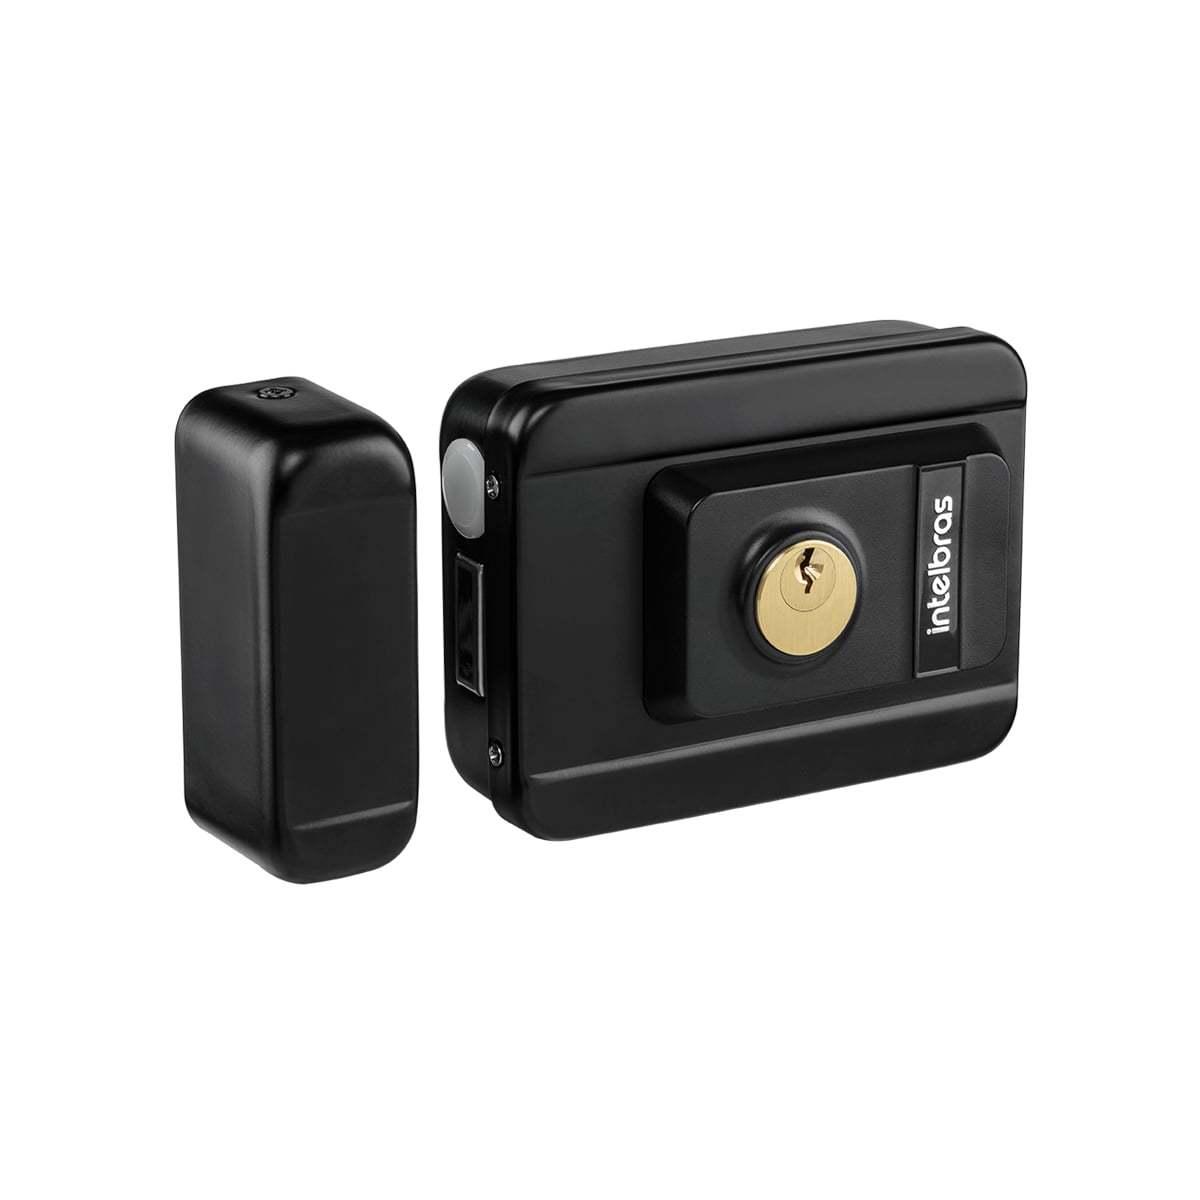 Fechadura Eletrônica c/ Leitor de Tag RFID Intelbras FX 3000 MF